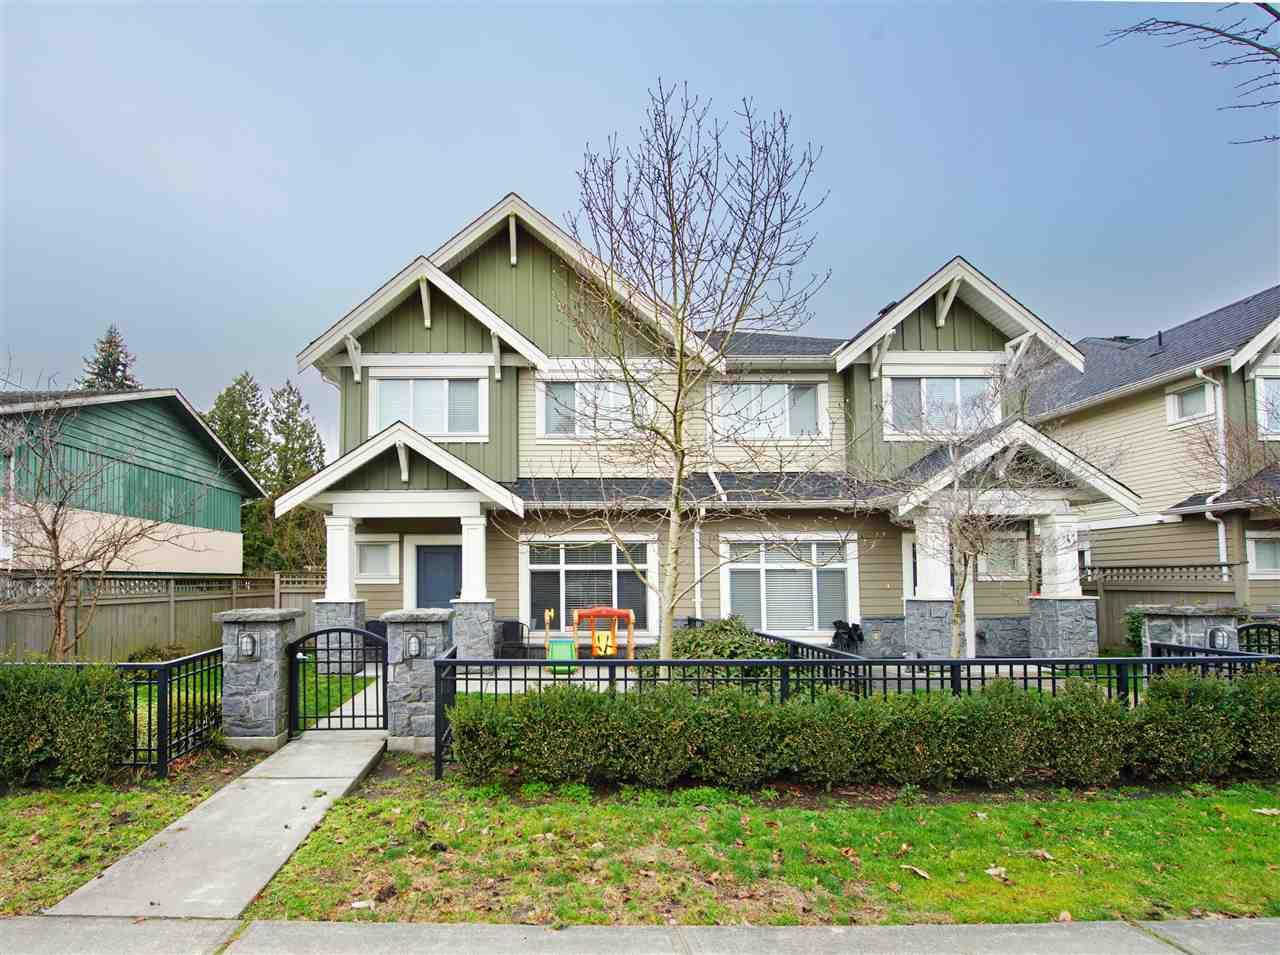 Buliding: 9888 Keefer Avenue, Richmond, BC